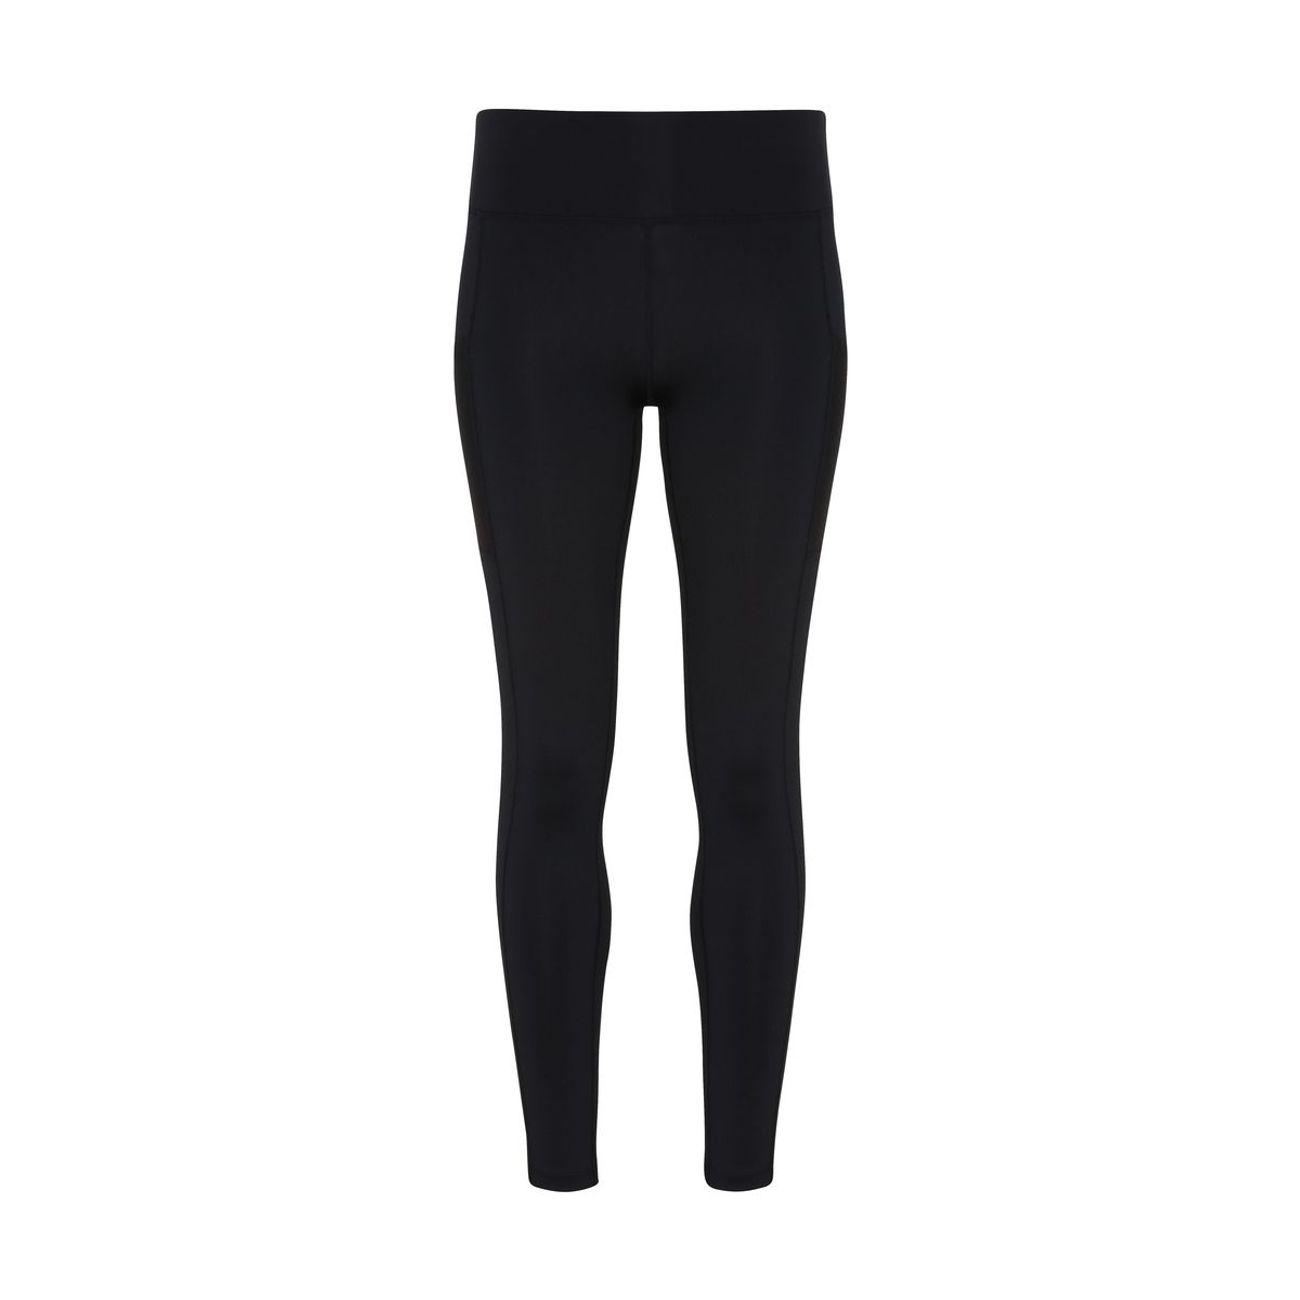 Fitness femme TRI DRI Legging performance compression femme - TR304 - noir